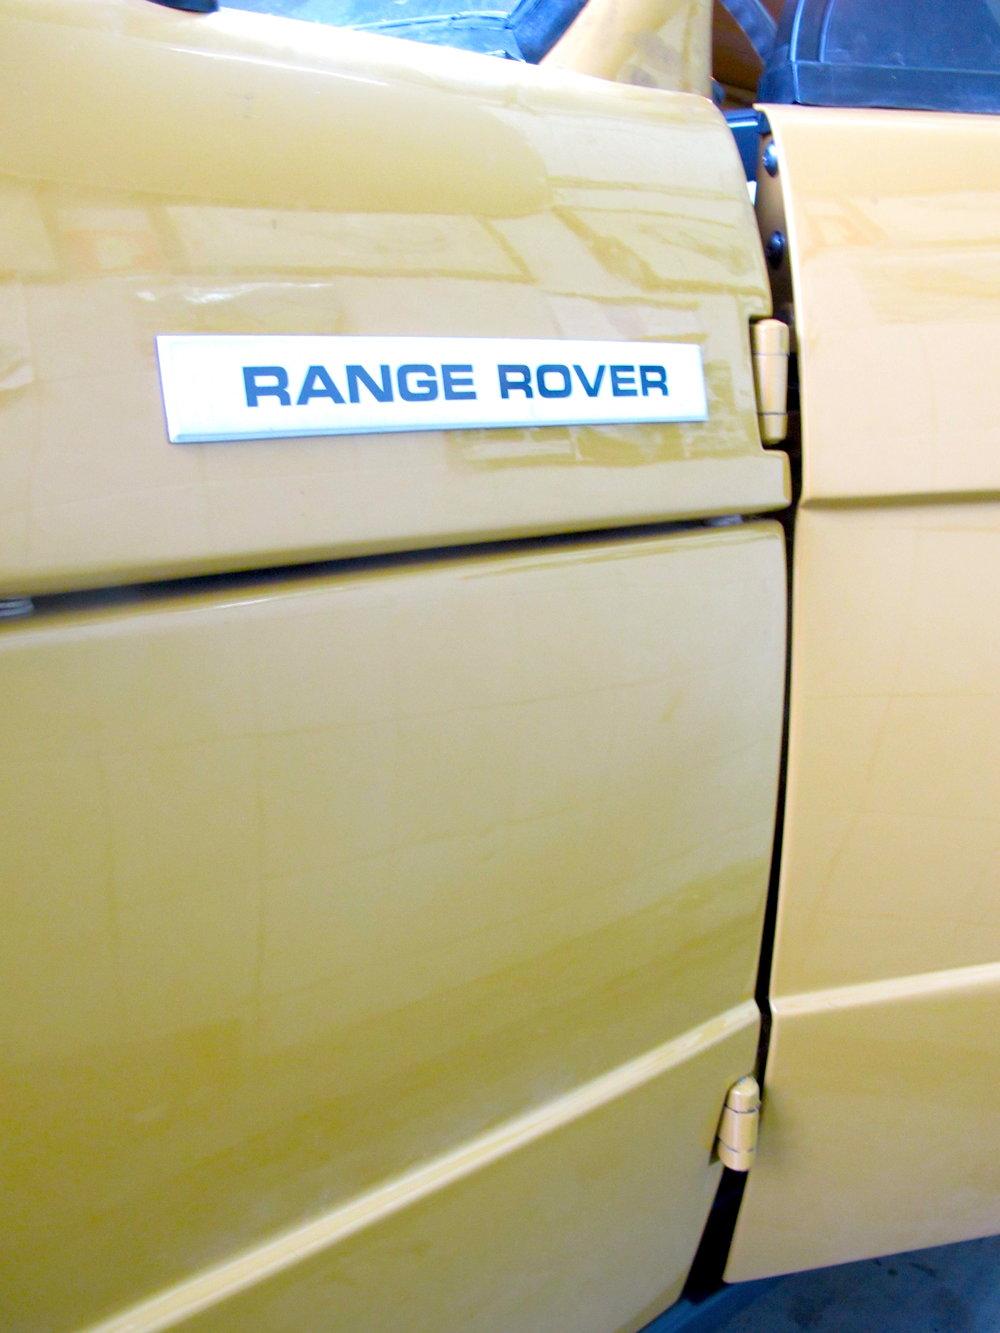 LegacyOverland_1973_RangeRover_BuildPhotos_73.JPG